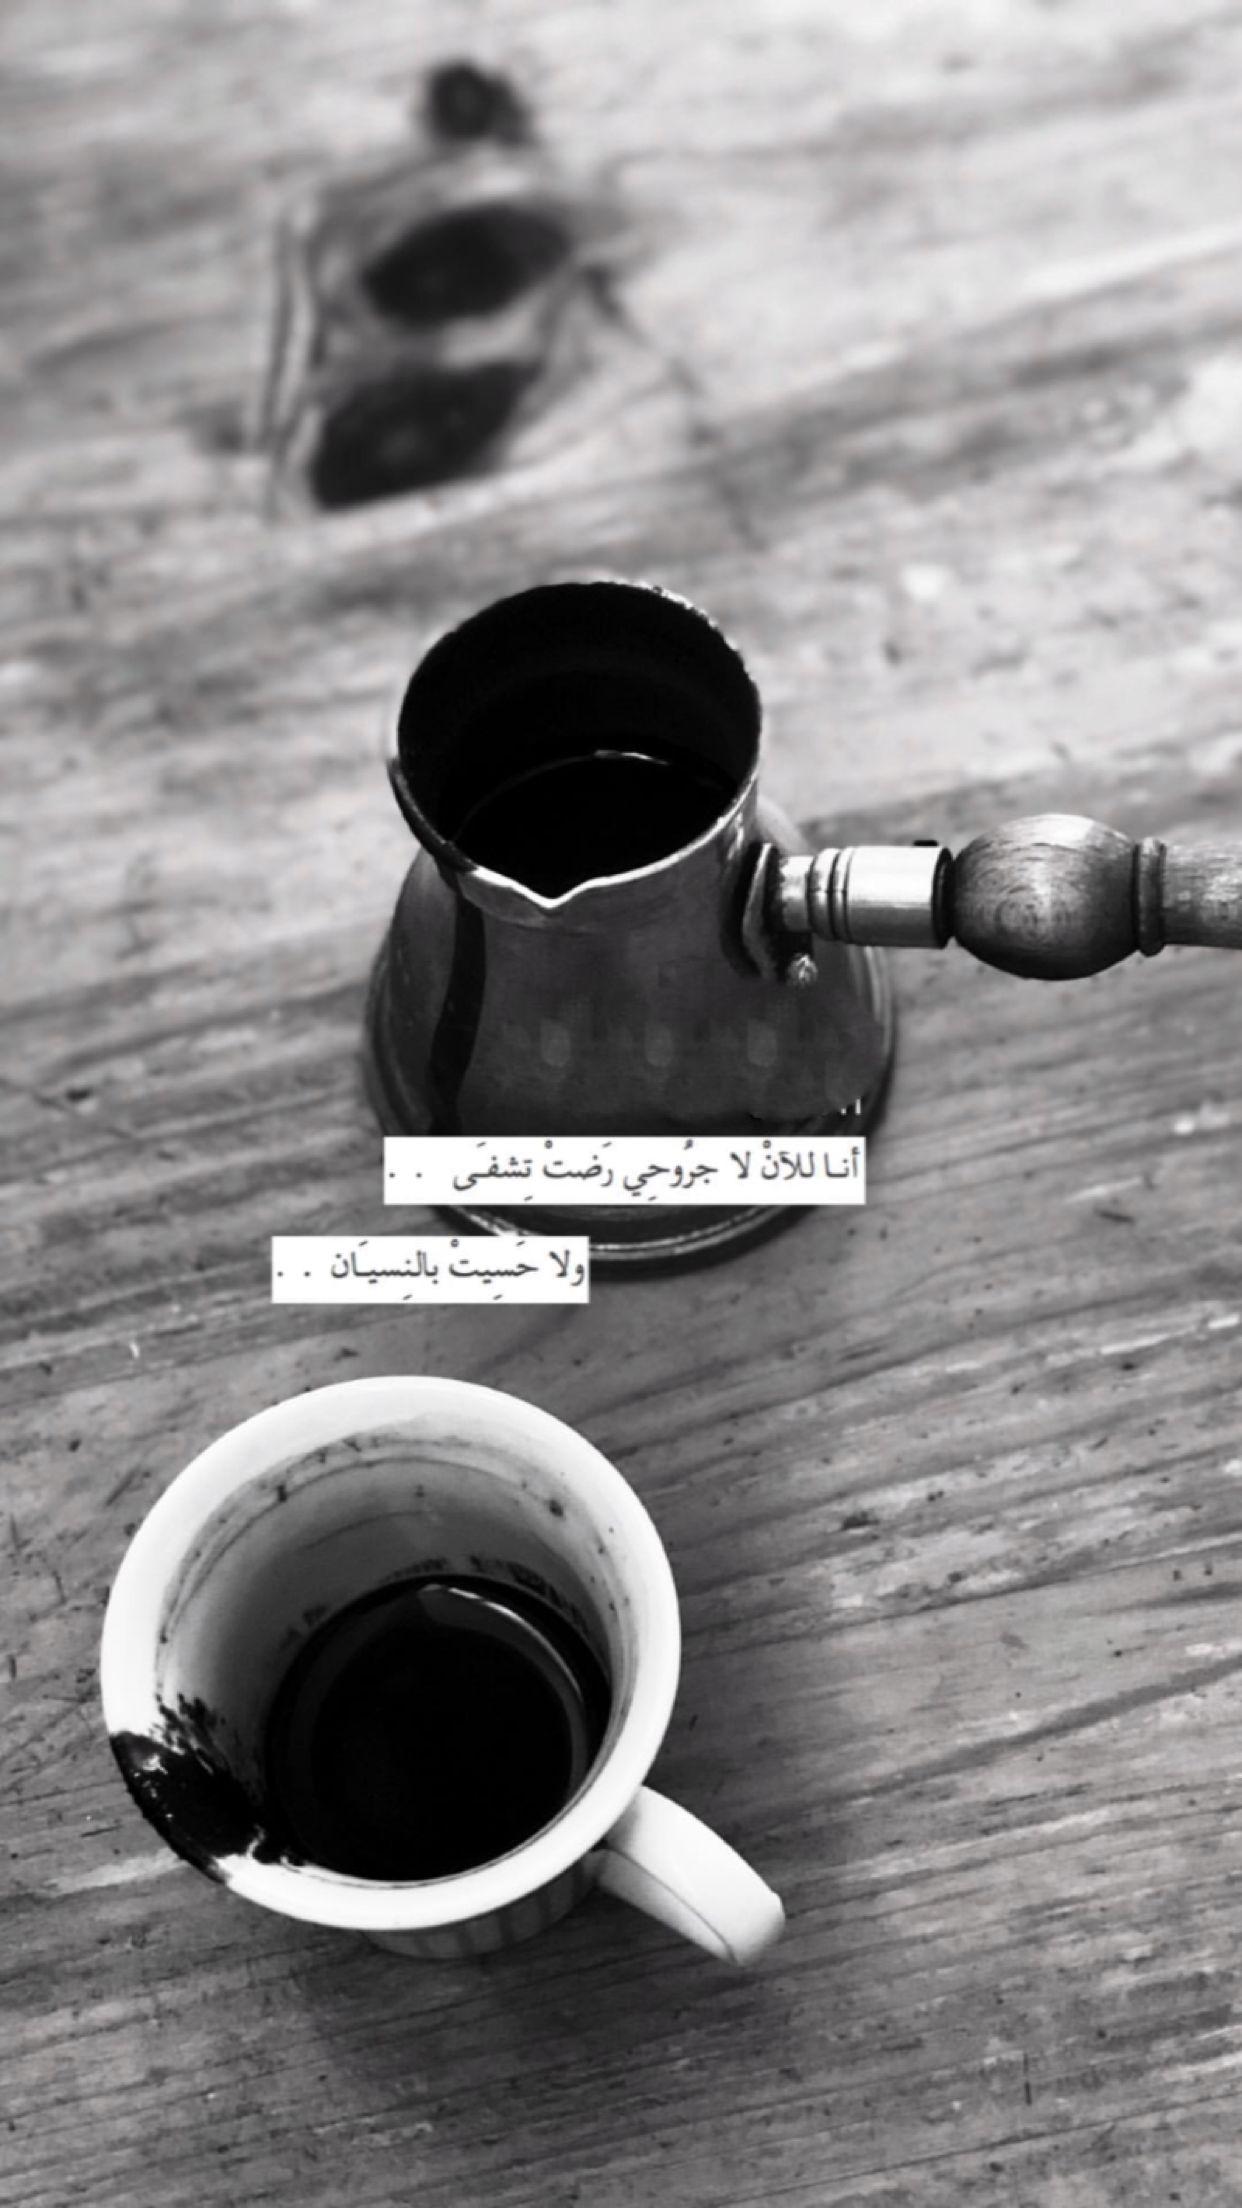 Coffee lover image by موضي البليهد on سناب موضي البليهد